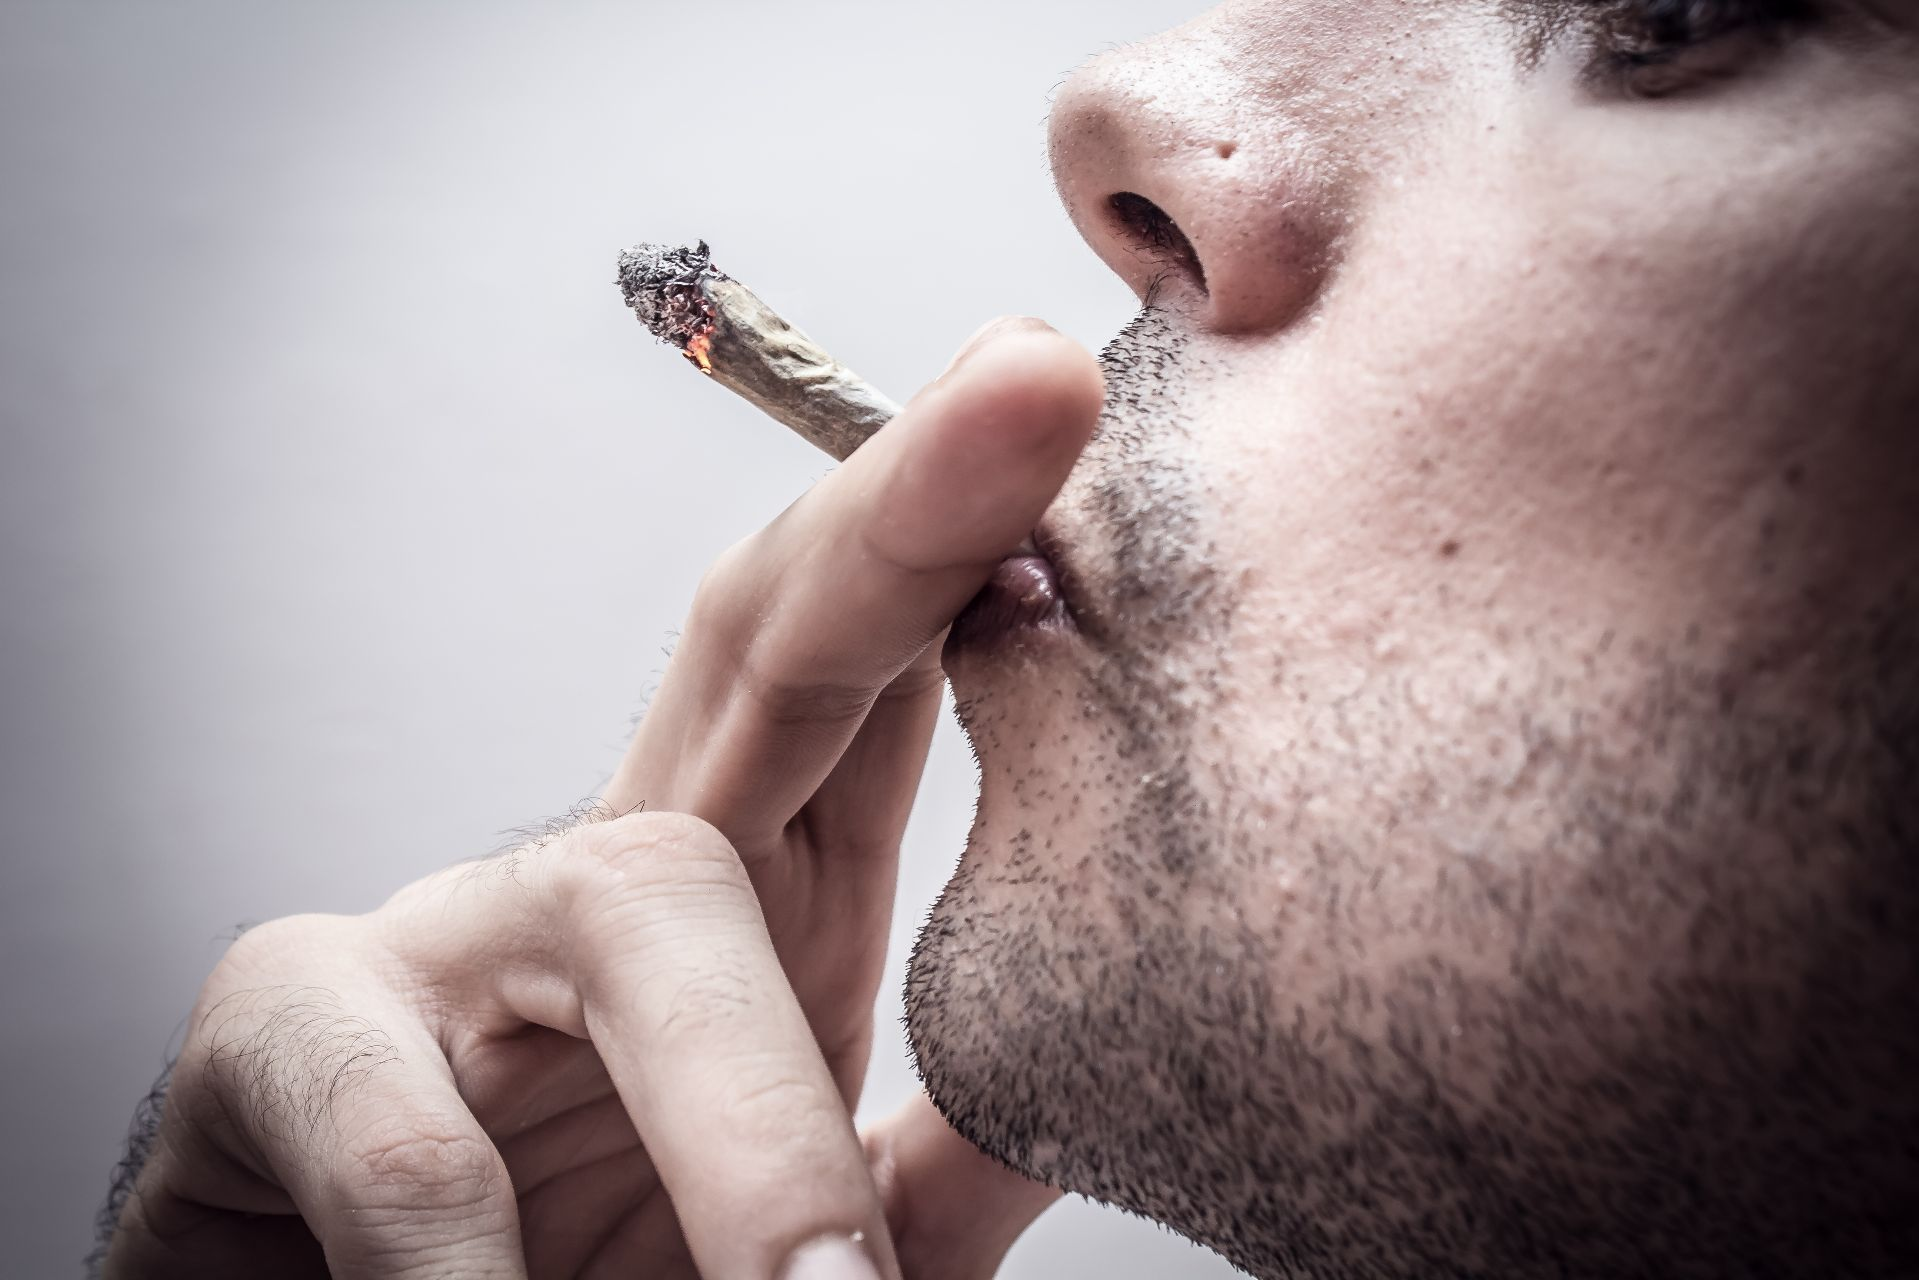 Luma-creative-cannabis-PTSD-1920.jpg